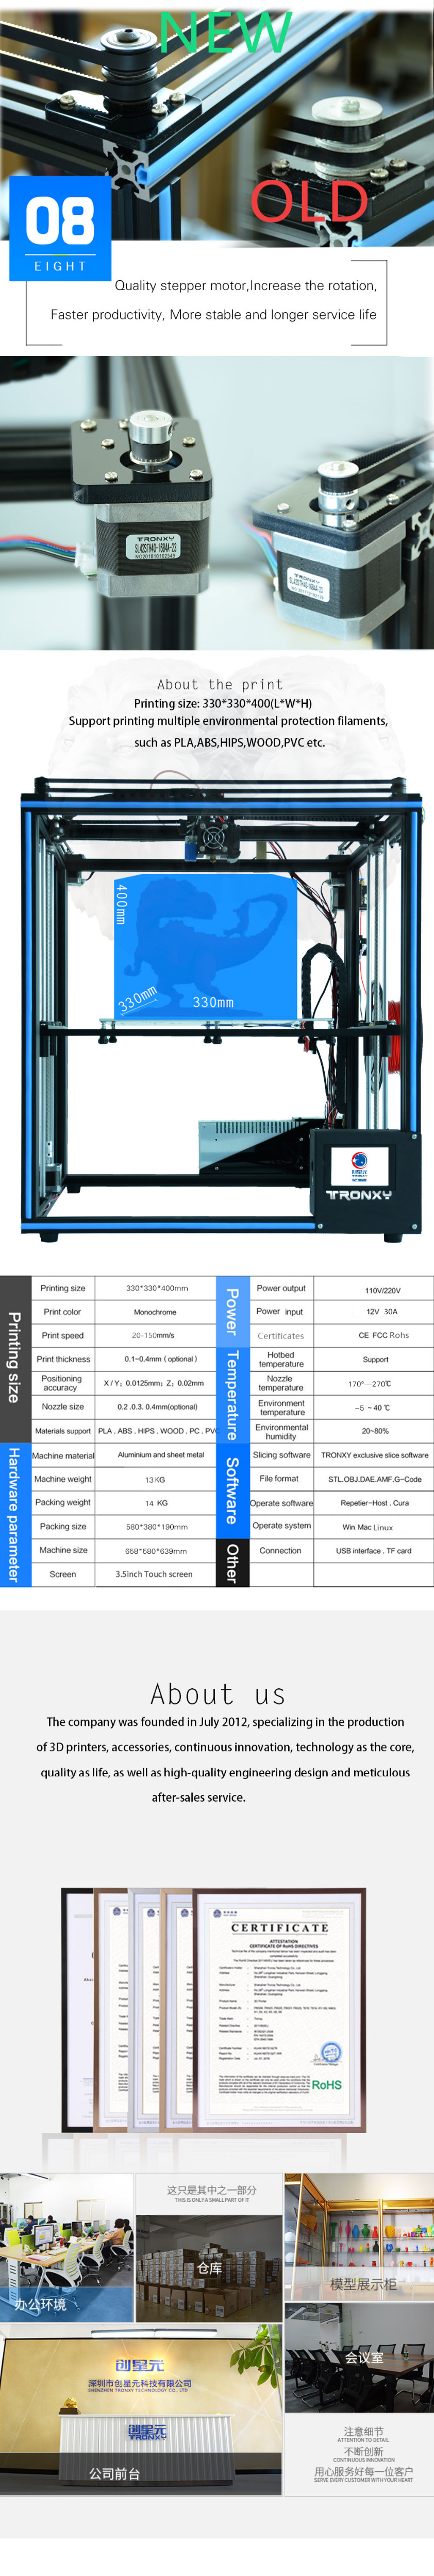 Newest Design Tronxy X5SA 24V Touch Screen Auto Level DIY 3D Printer Kit  Full Metal Large Printing Size Best Photo Printer Best Photo Printers From